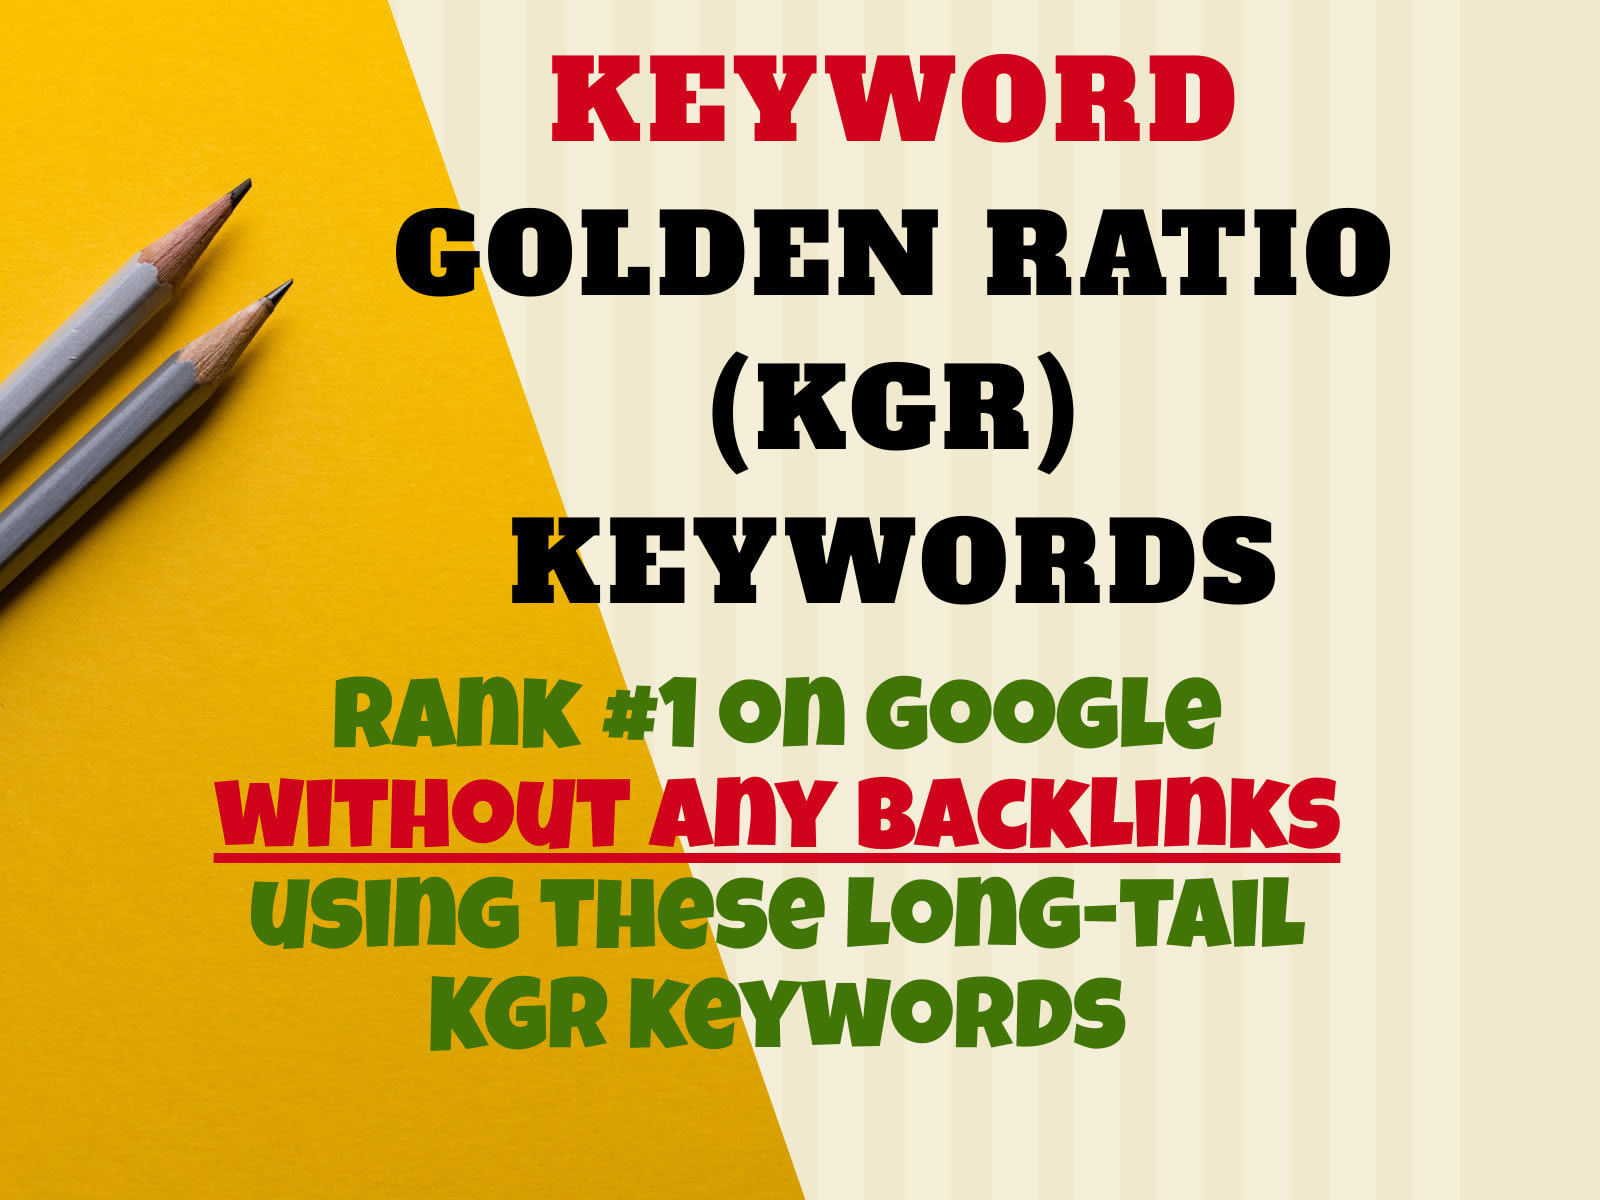 Find 15 Keywords Using KGR Keyword Golden Ratio Using Ahrefs